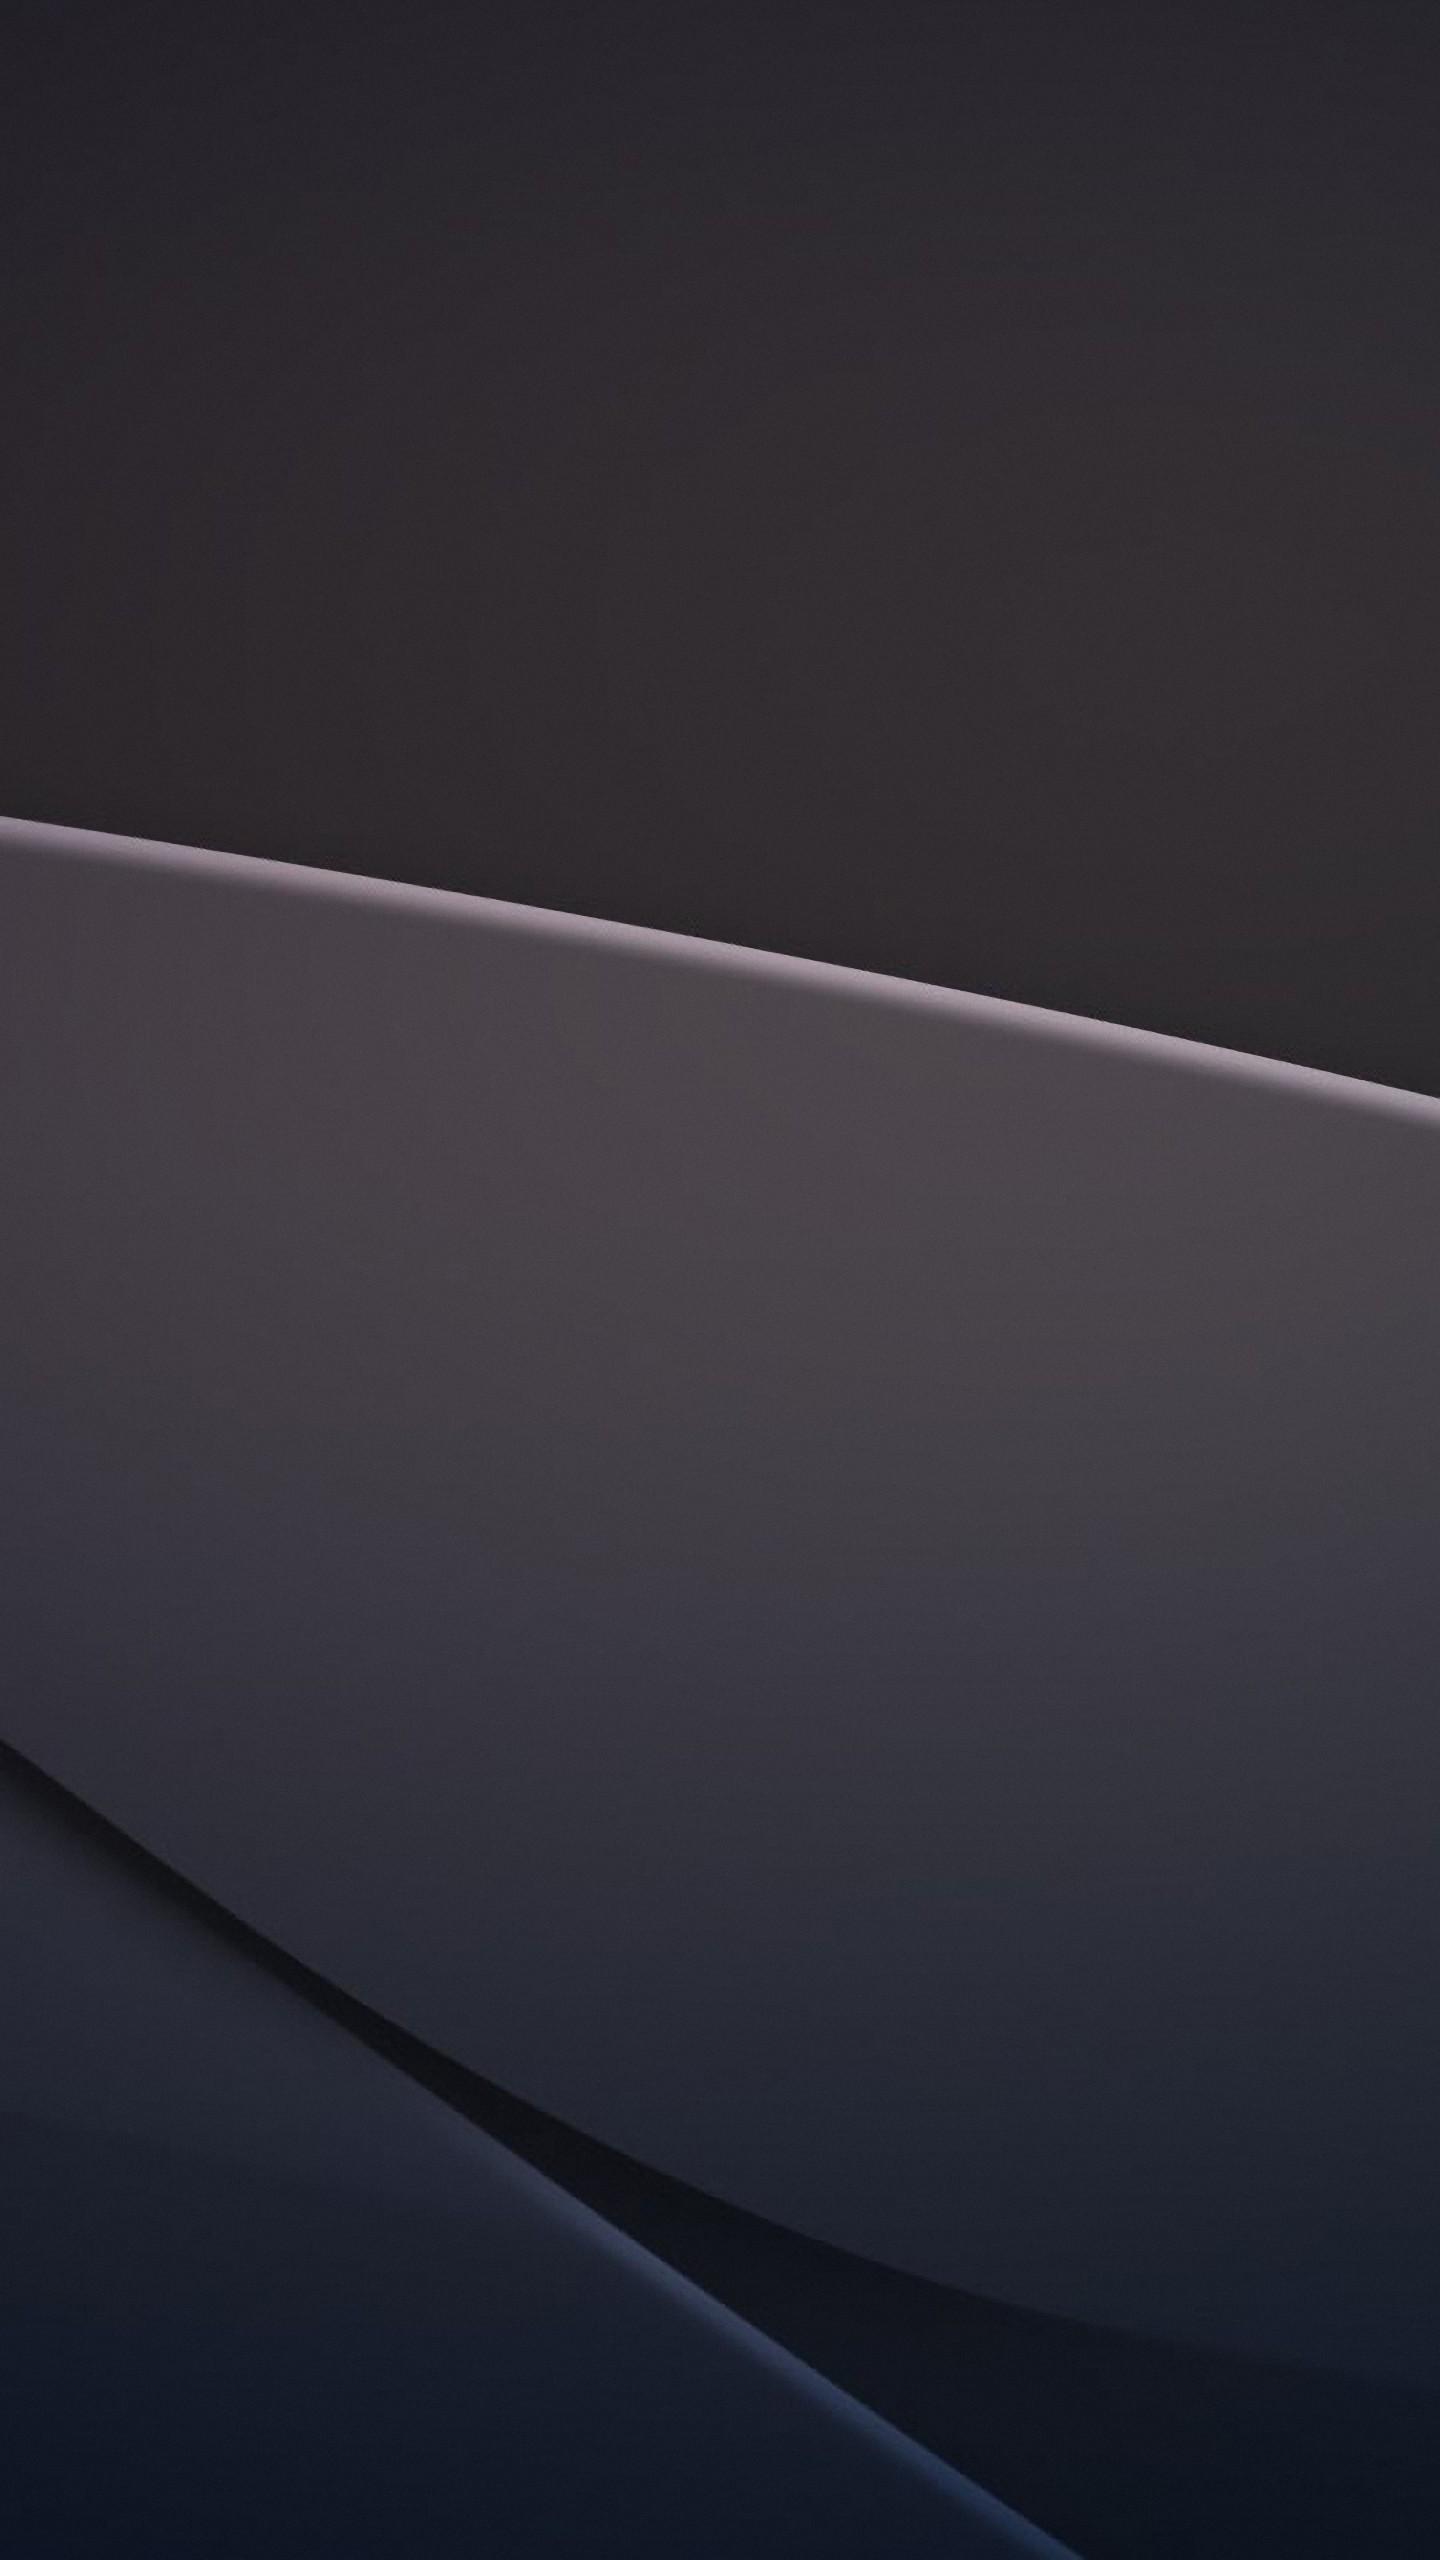 HD metallic curves lg g3 wallpapers